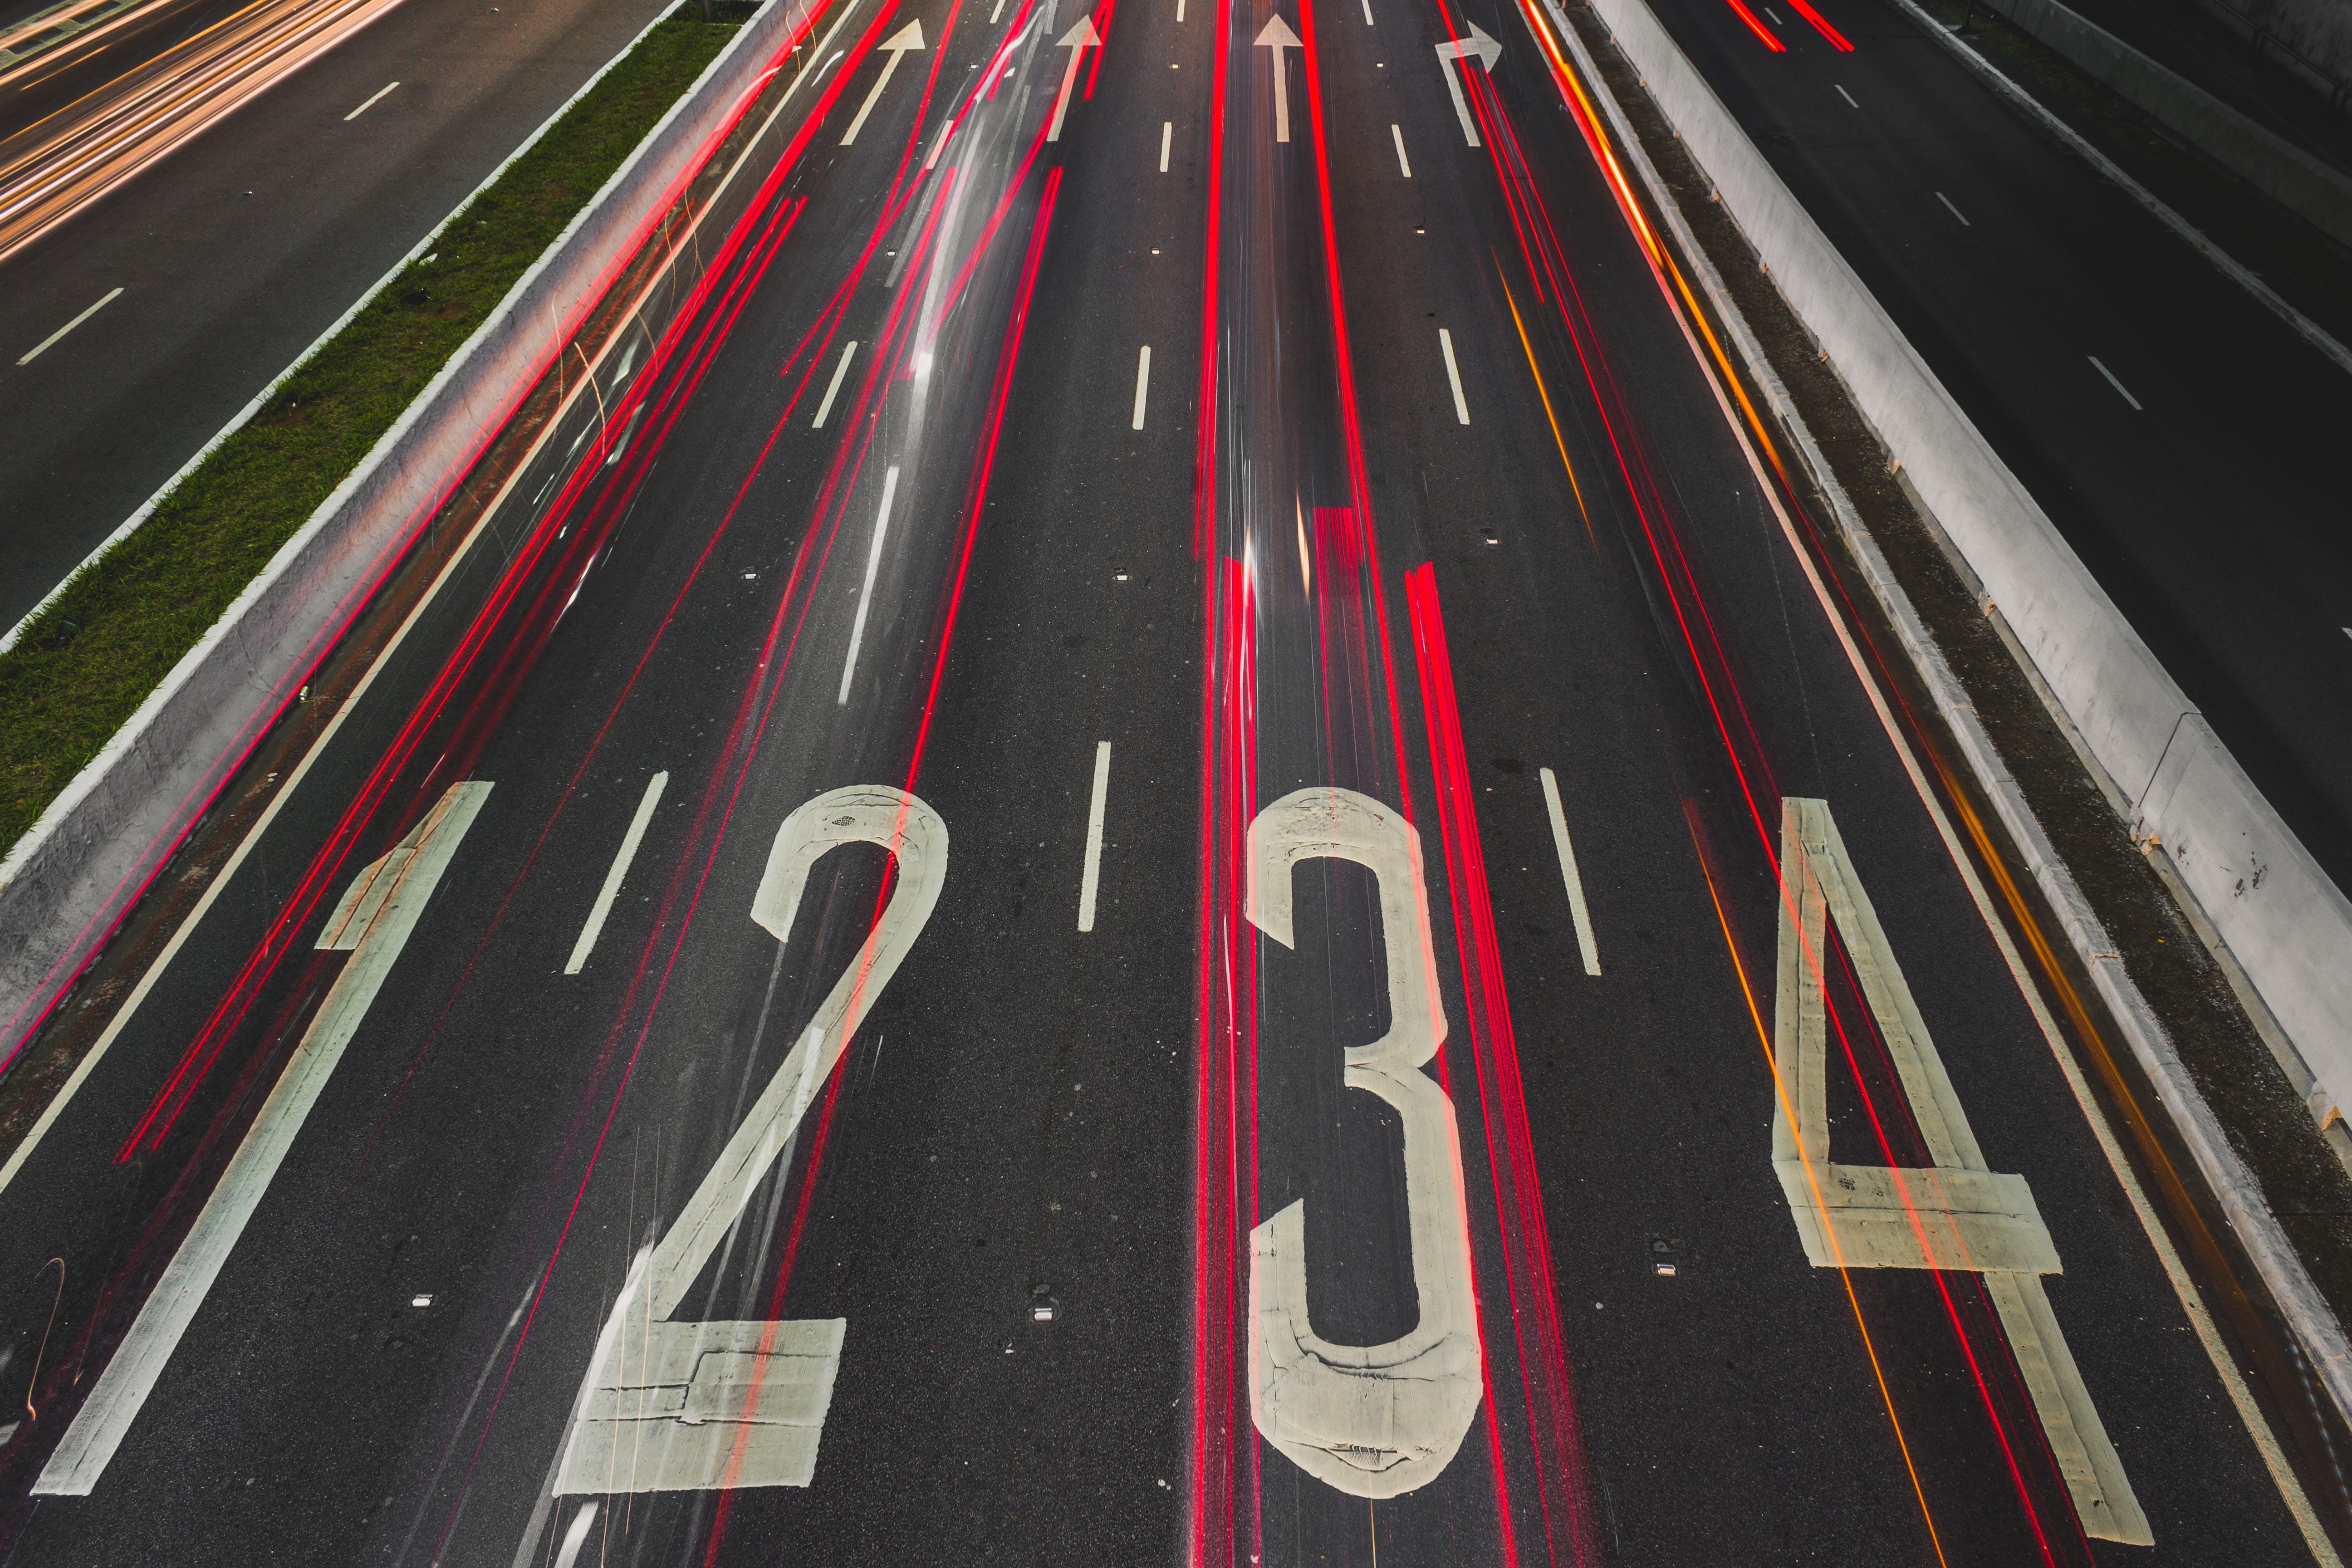 Kostenloses Stock Foto zu asphalt, autobahn, beratung, bewegung